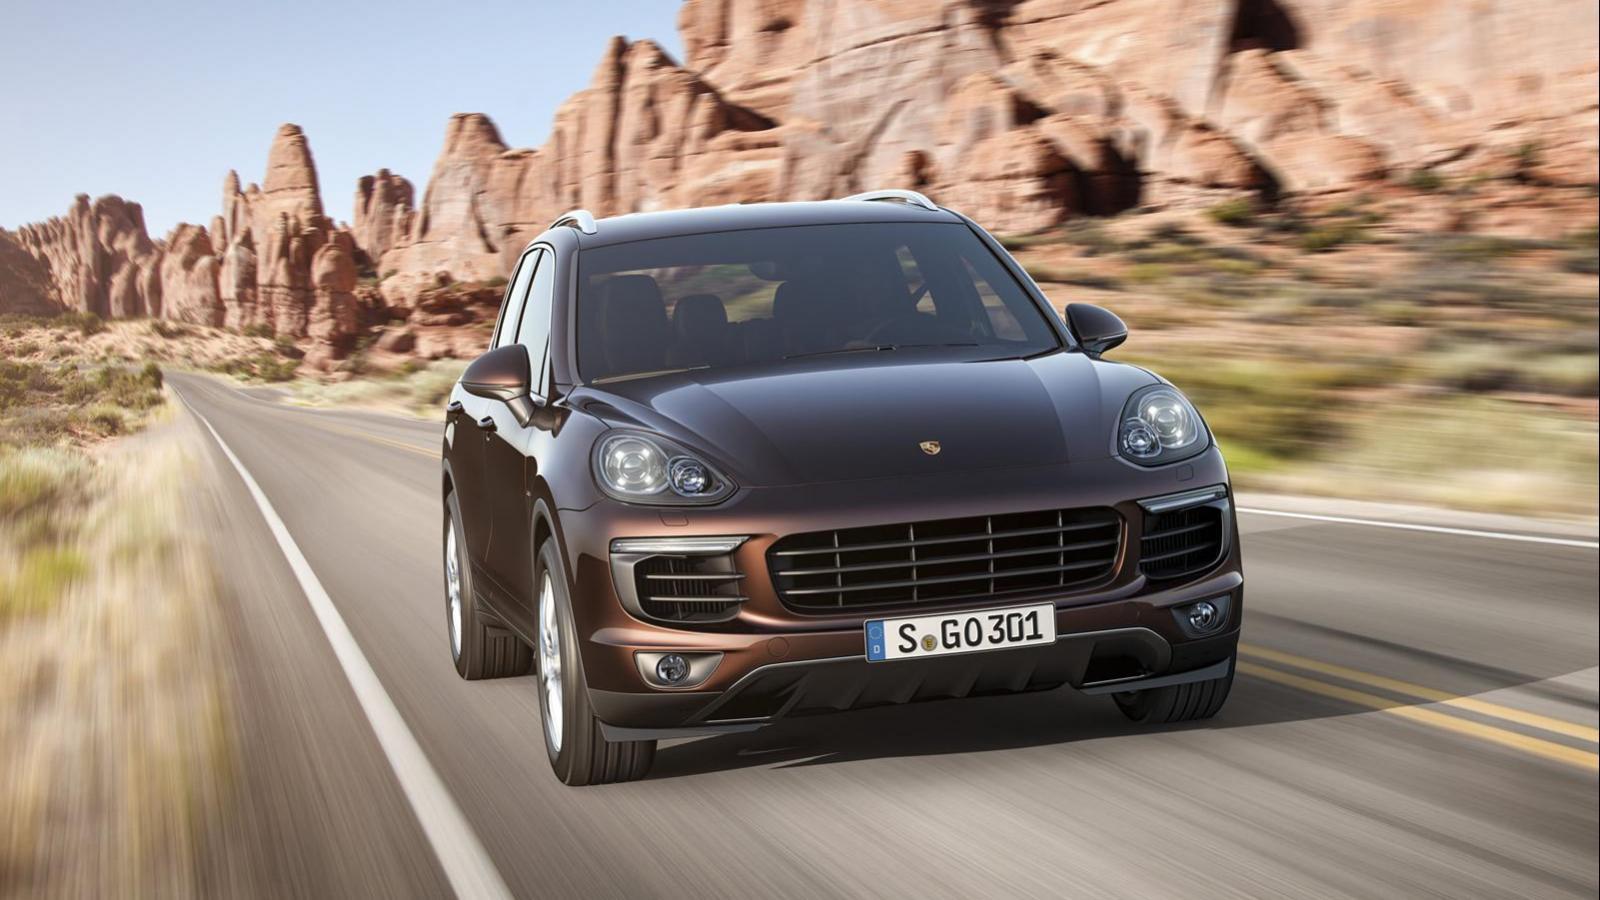 2015 Porsche Cayenne Front End Photos-1600x900